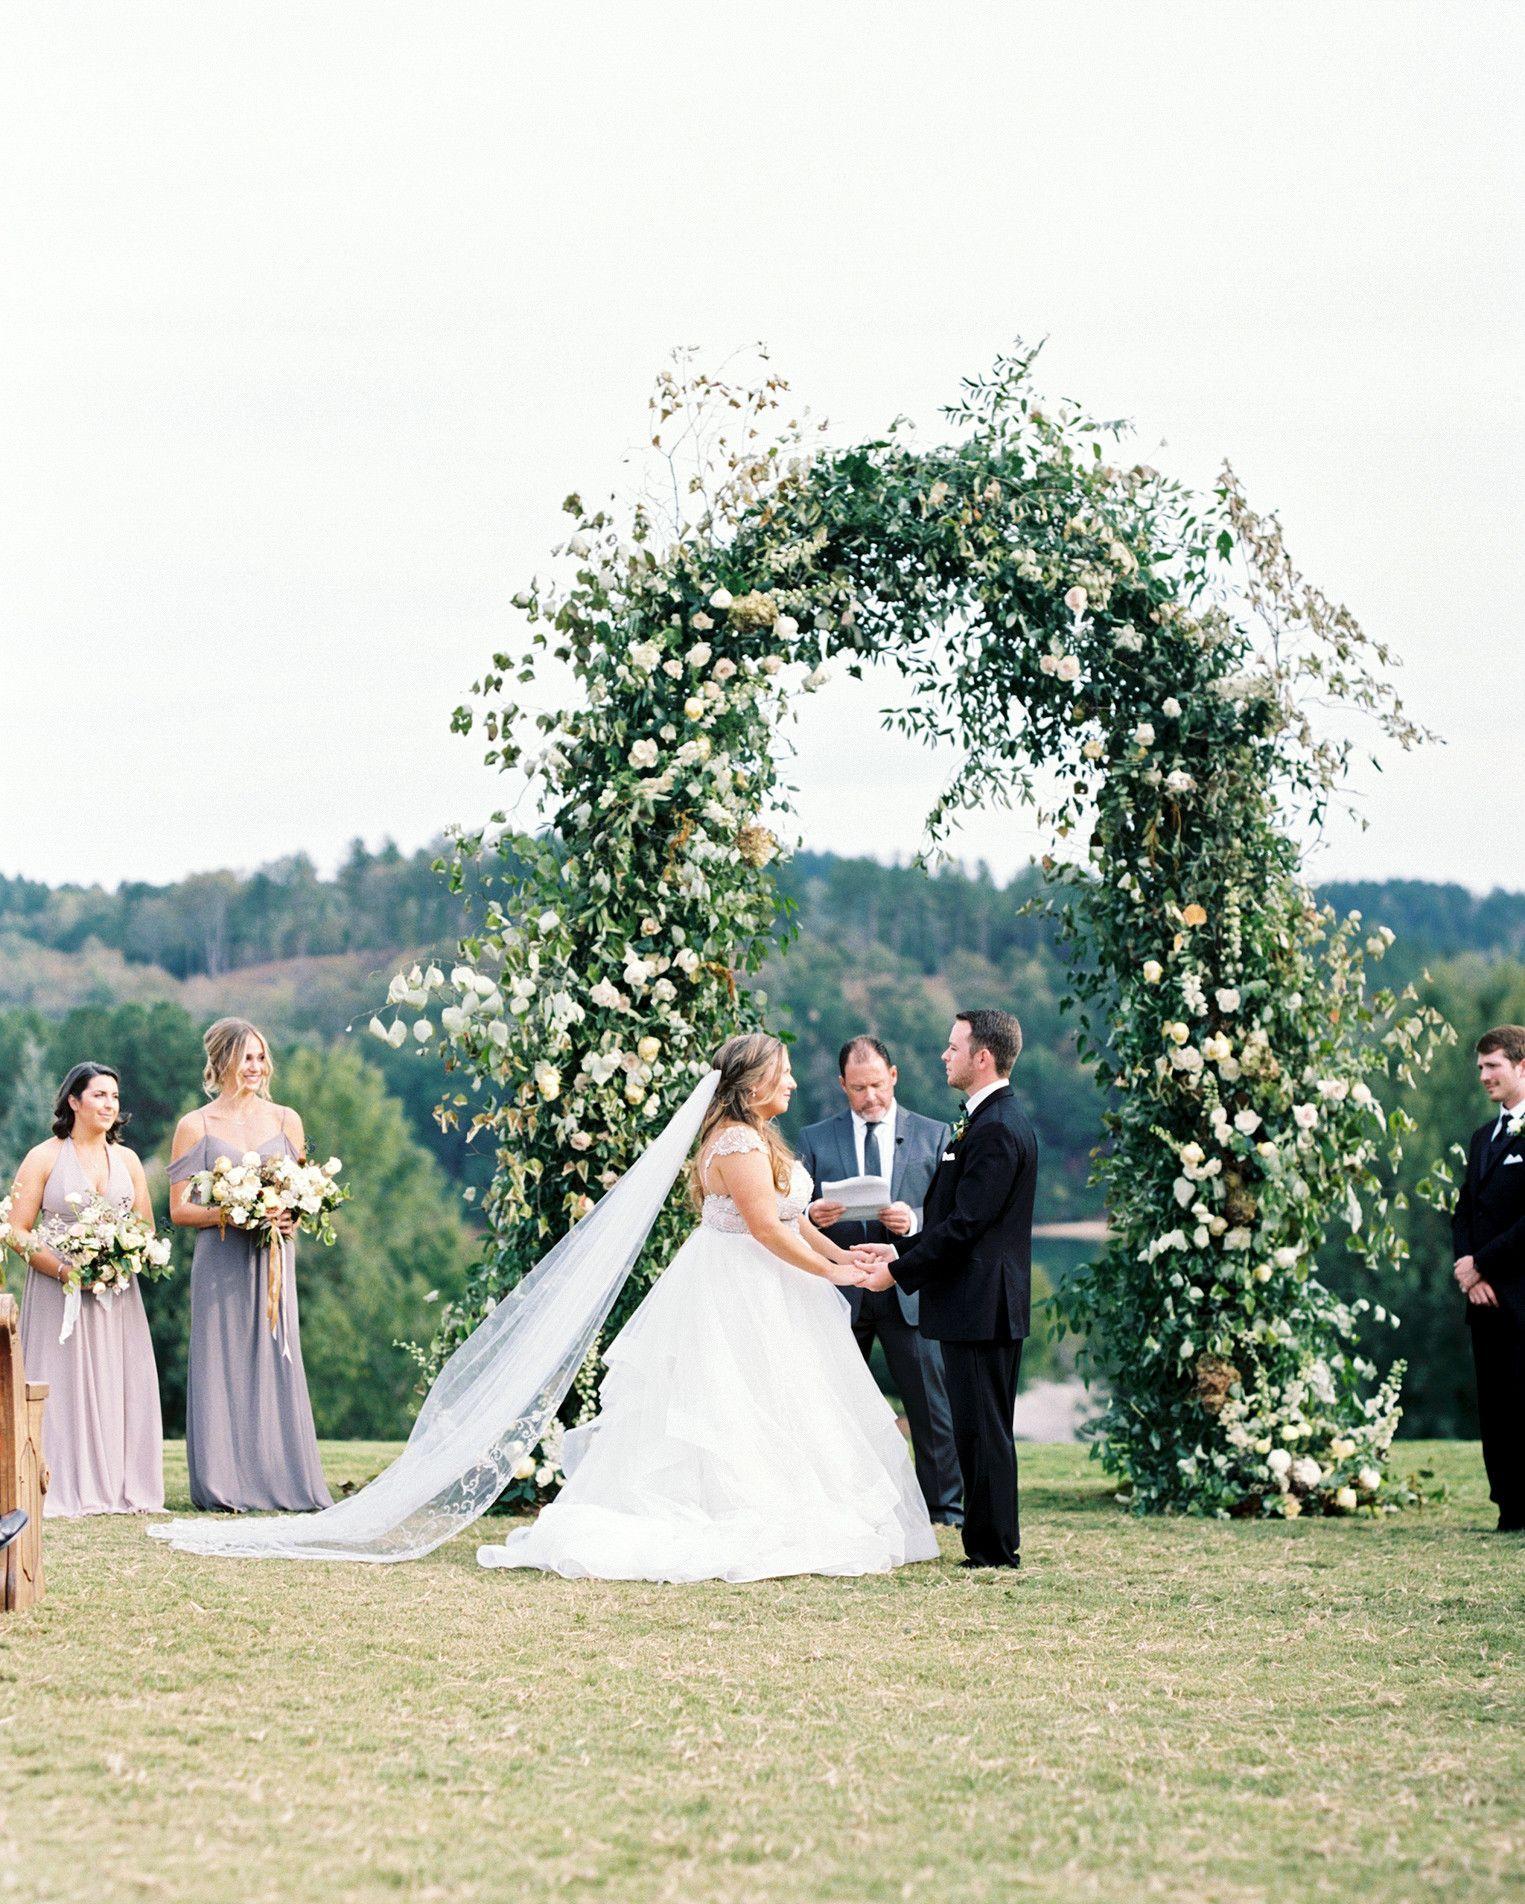 One Couple's Elegant Lakeside Wedding in South Carolina | Outdoor